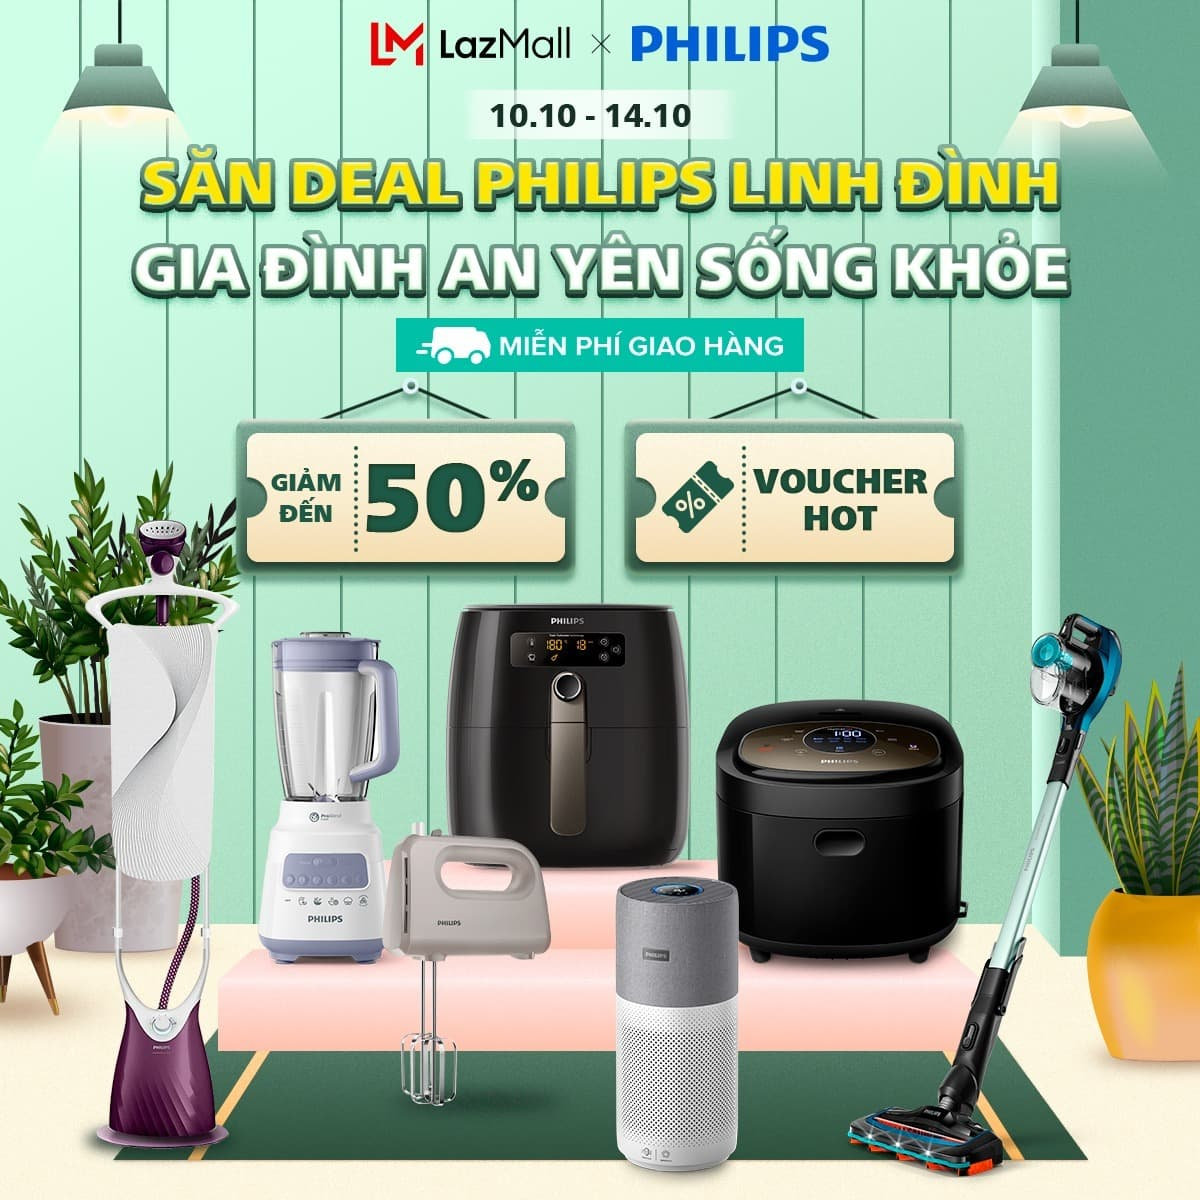 Philips Sale 10.10